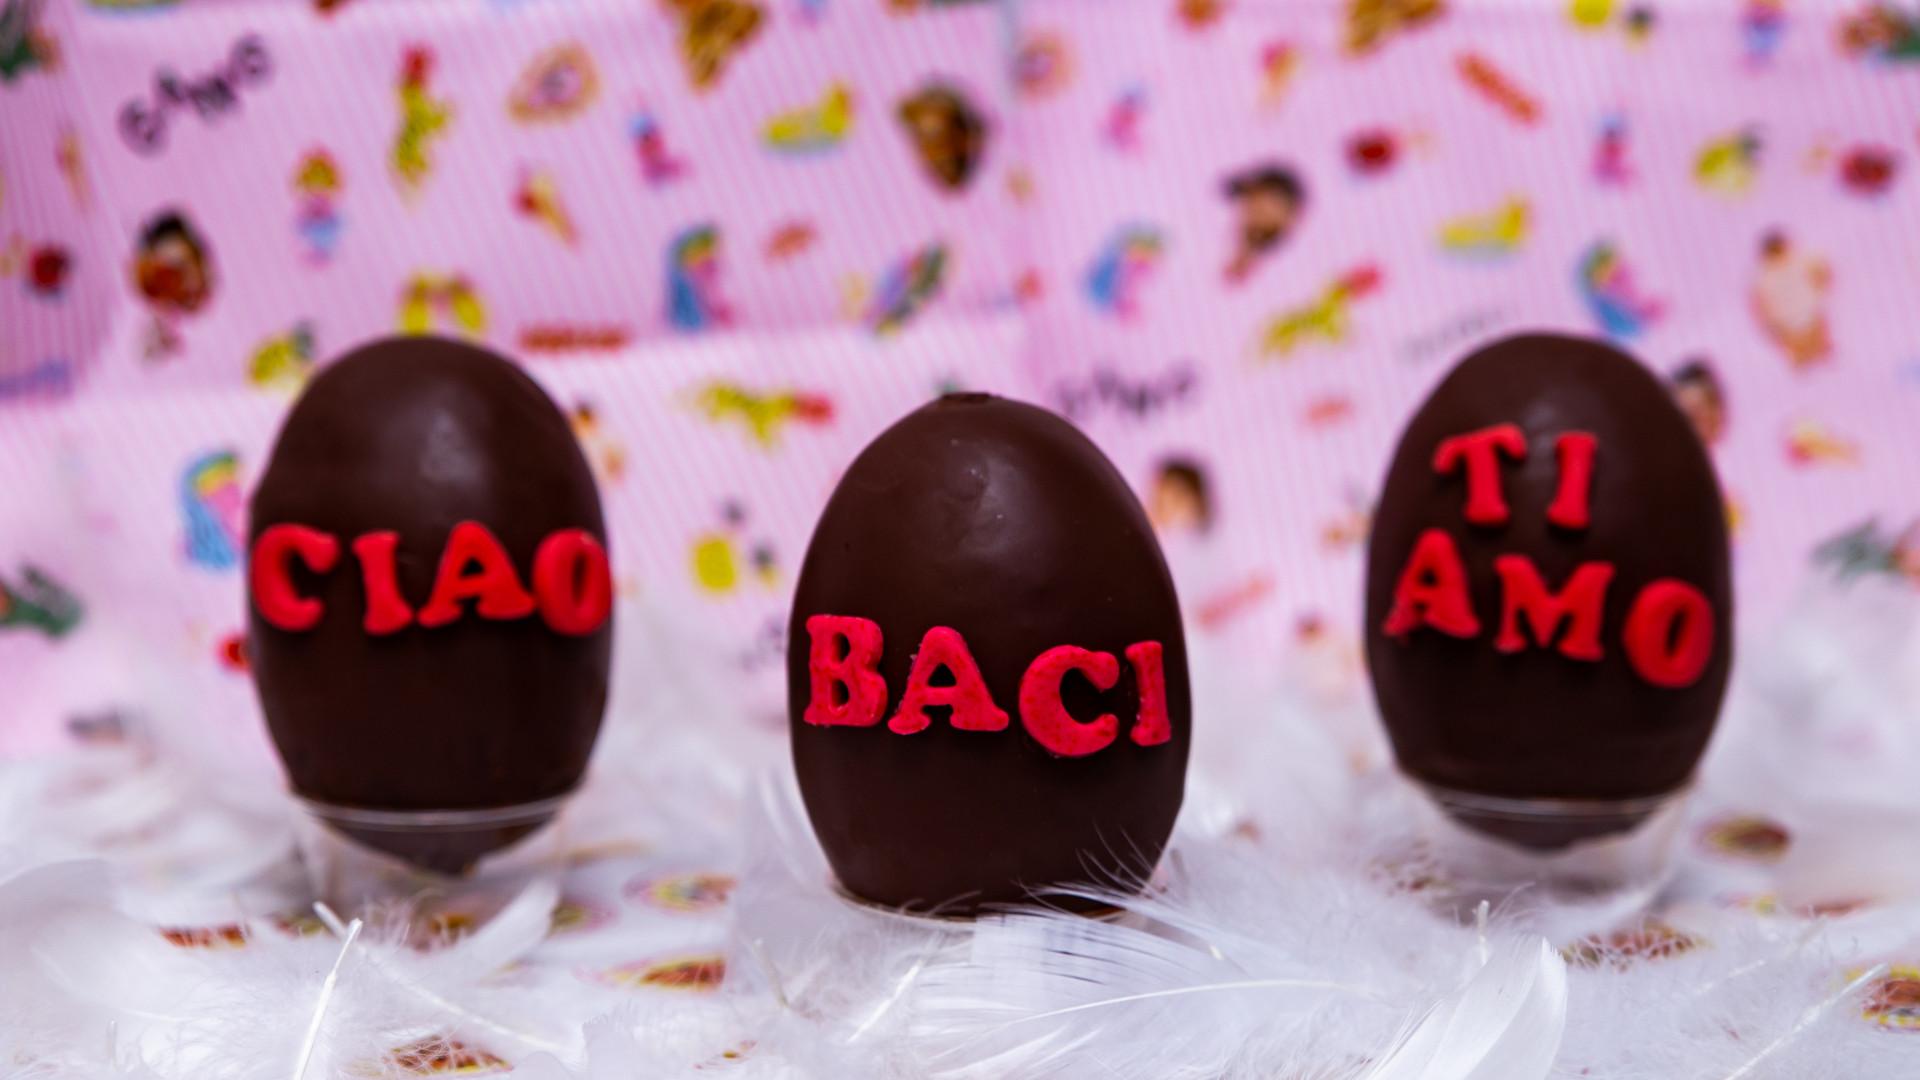 Easter 2021: Napoli Gang's Easter eggs